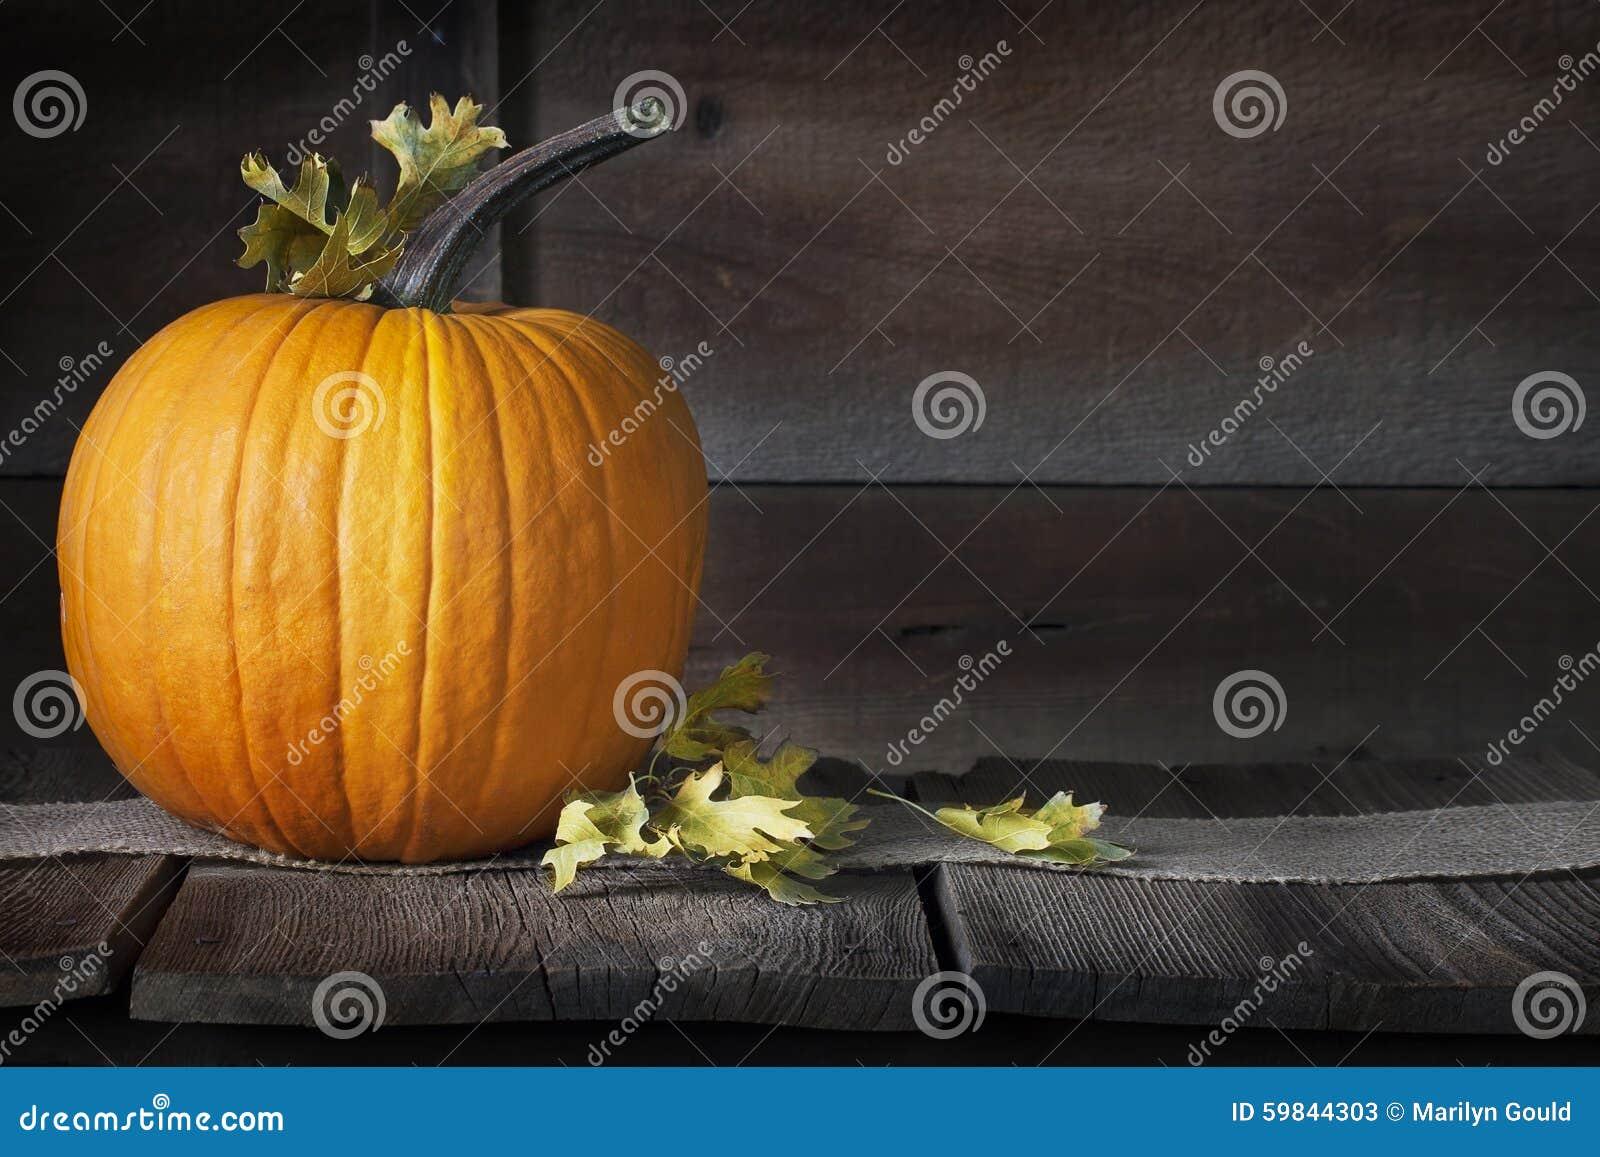 Pumpkin Fall Leaves